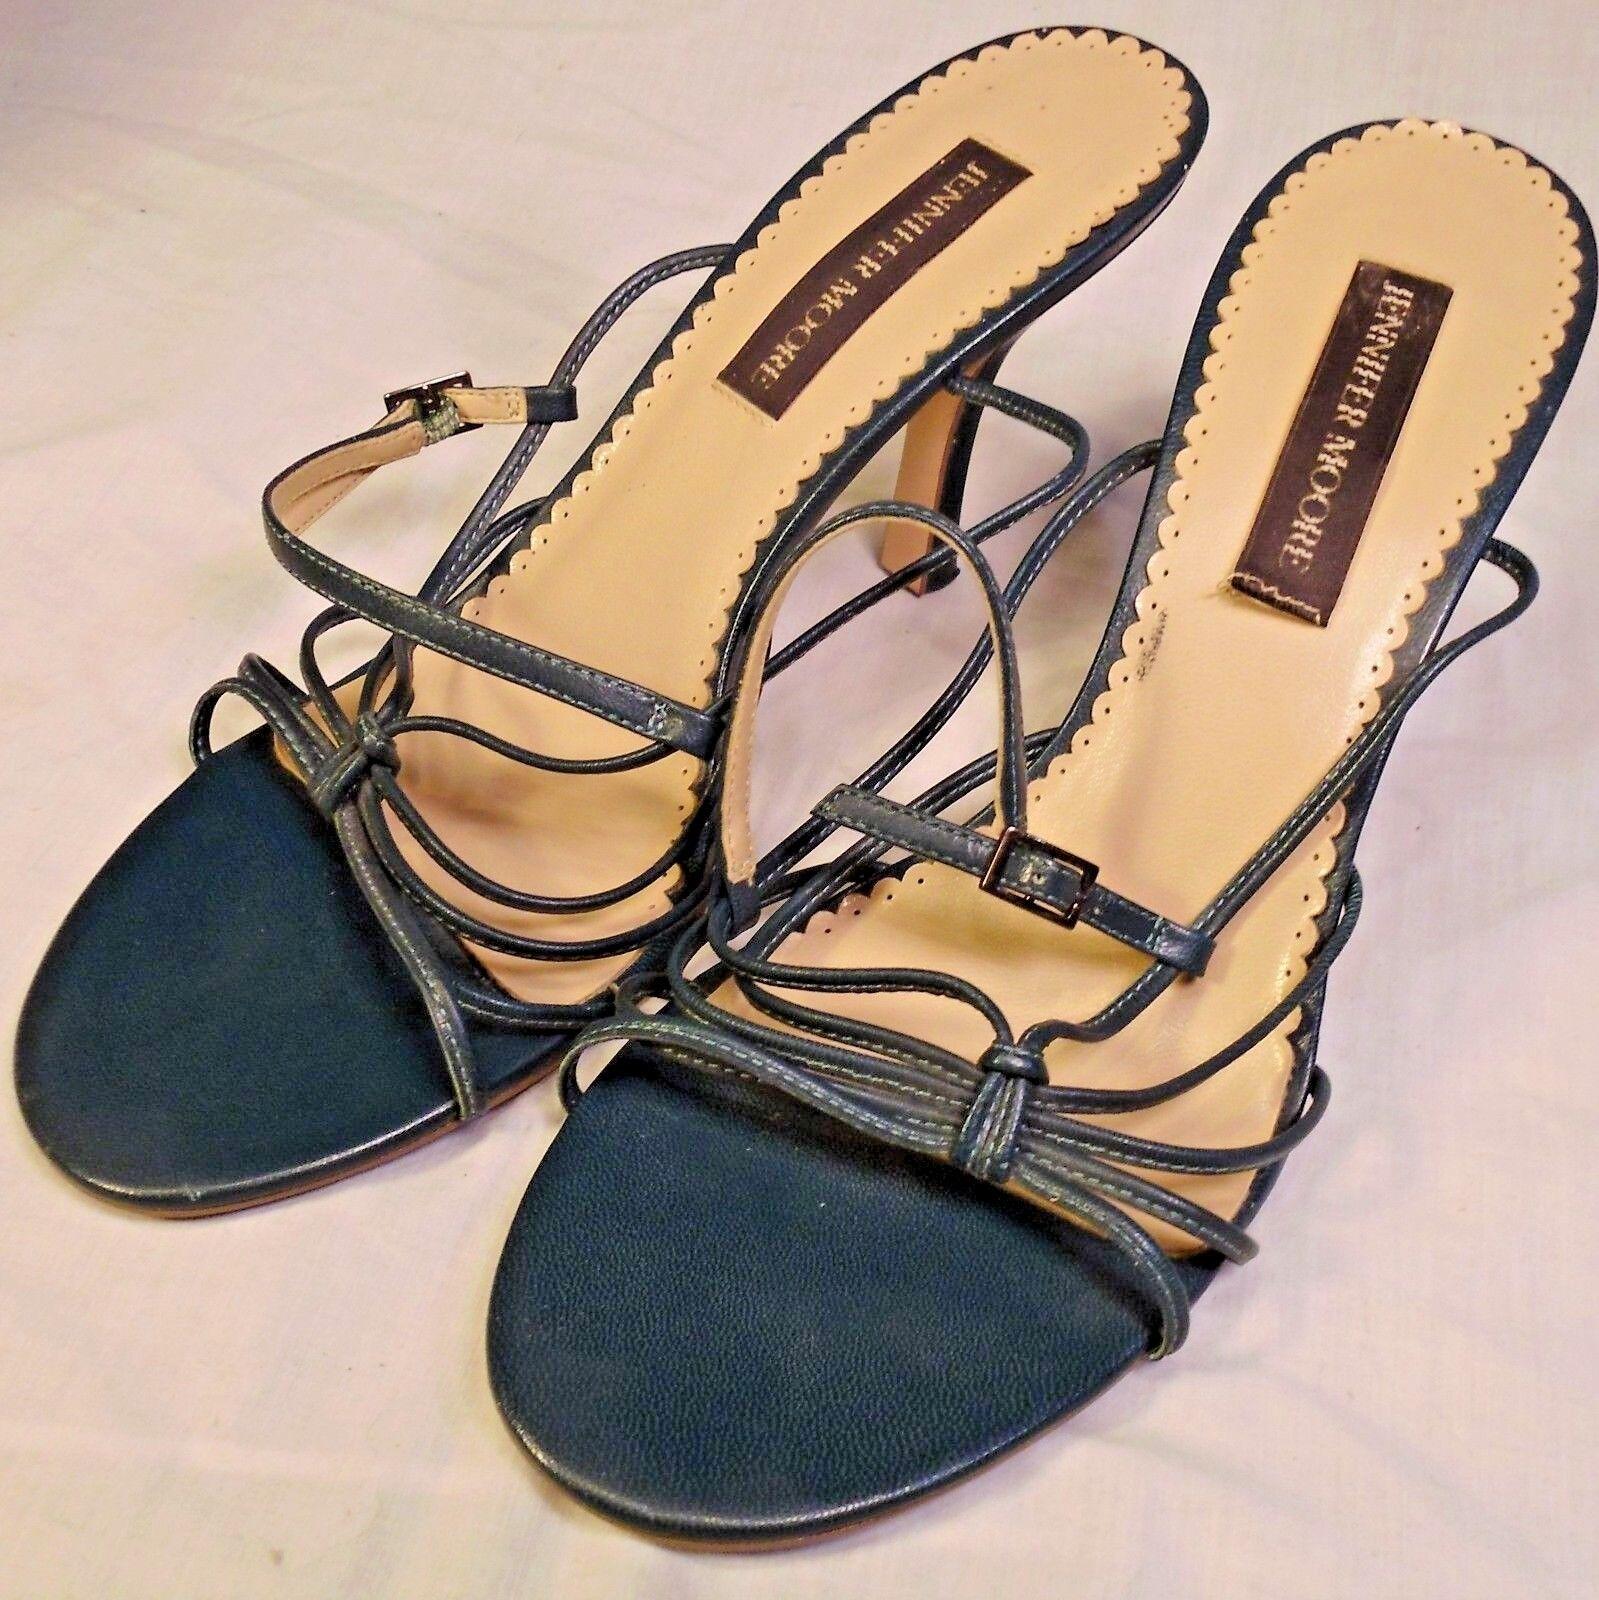 Jennifer Moore Sexy High Heels Saucy 9.5M Stilettos Green Strappy Open Toe Stilettos 9.5M Shoes 9c1e5e